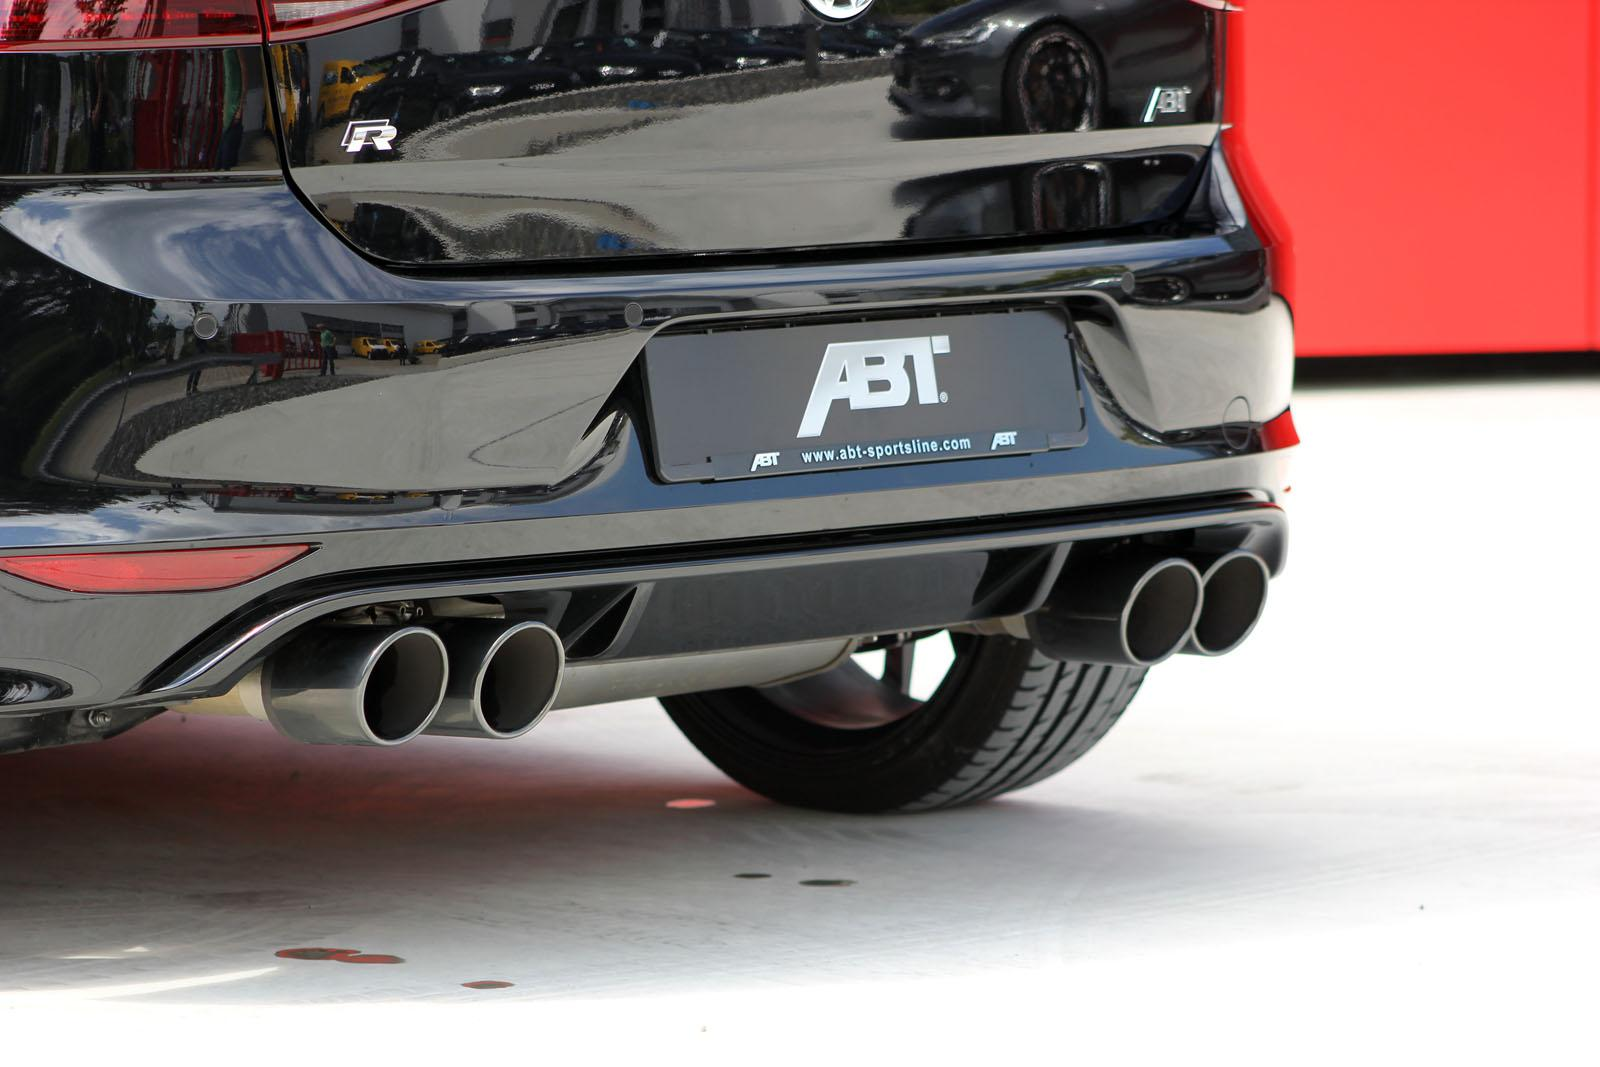 Выхлопные трубы Volkswagen Golf R от ABT Sportsline